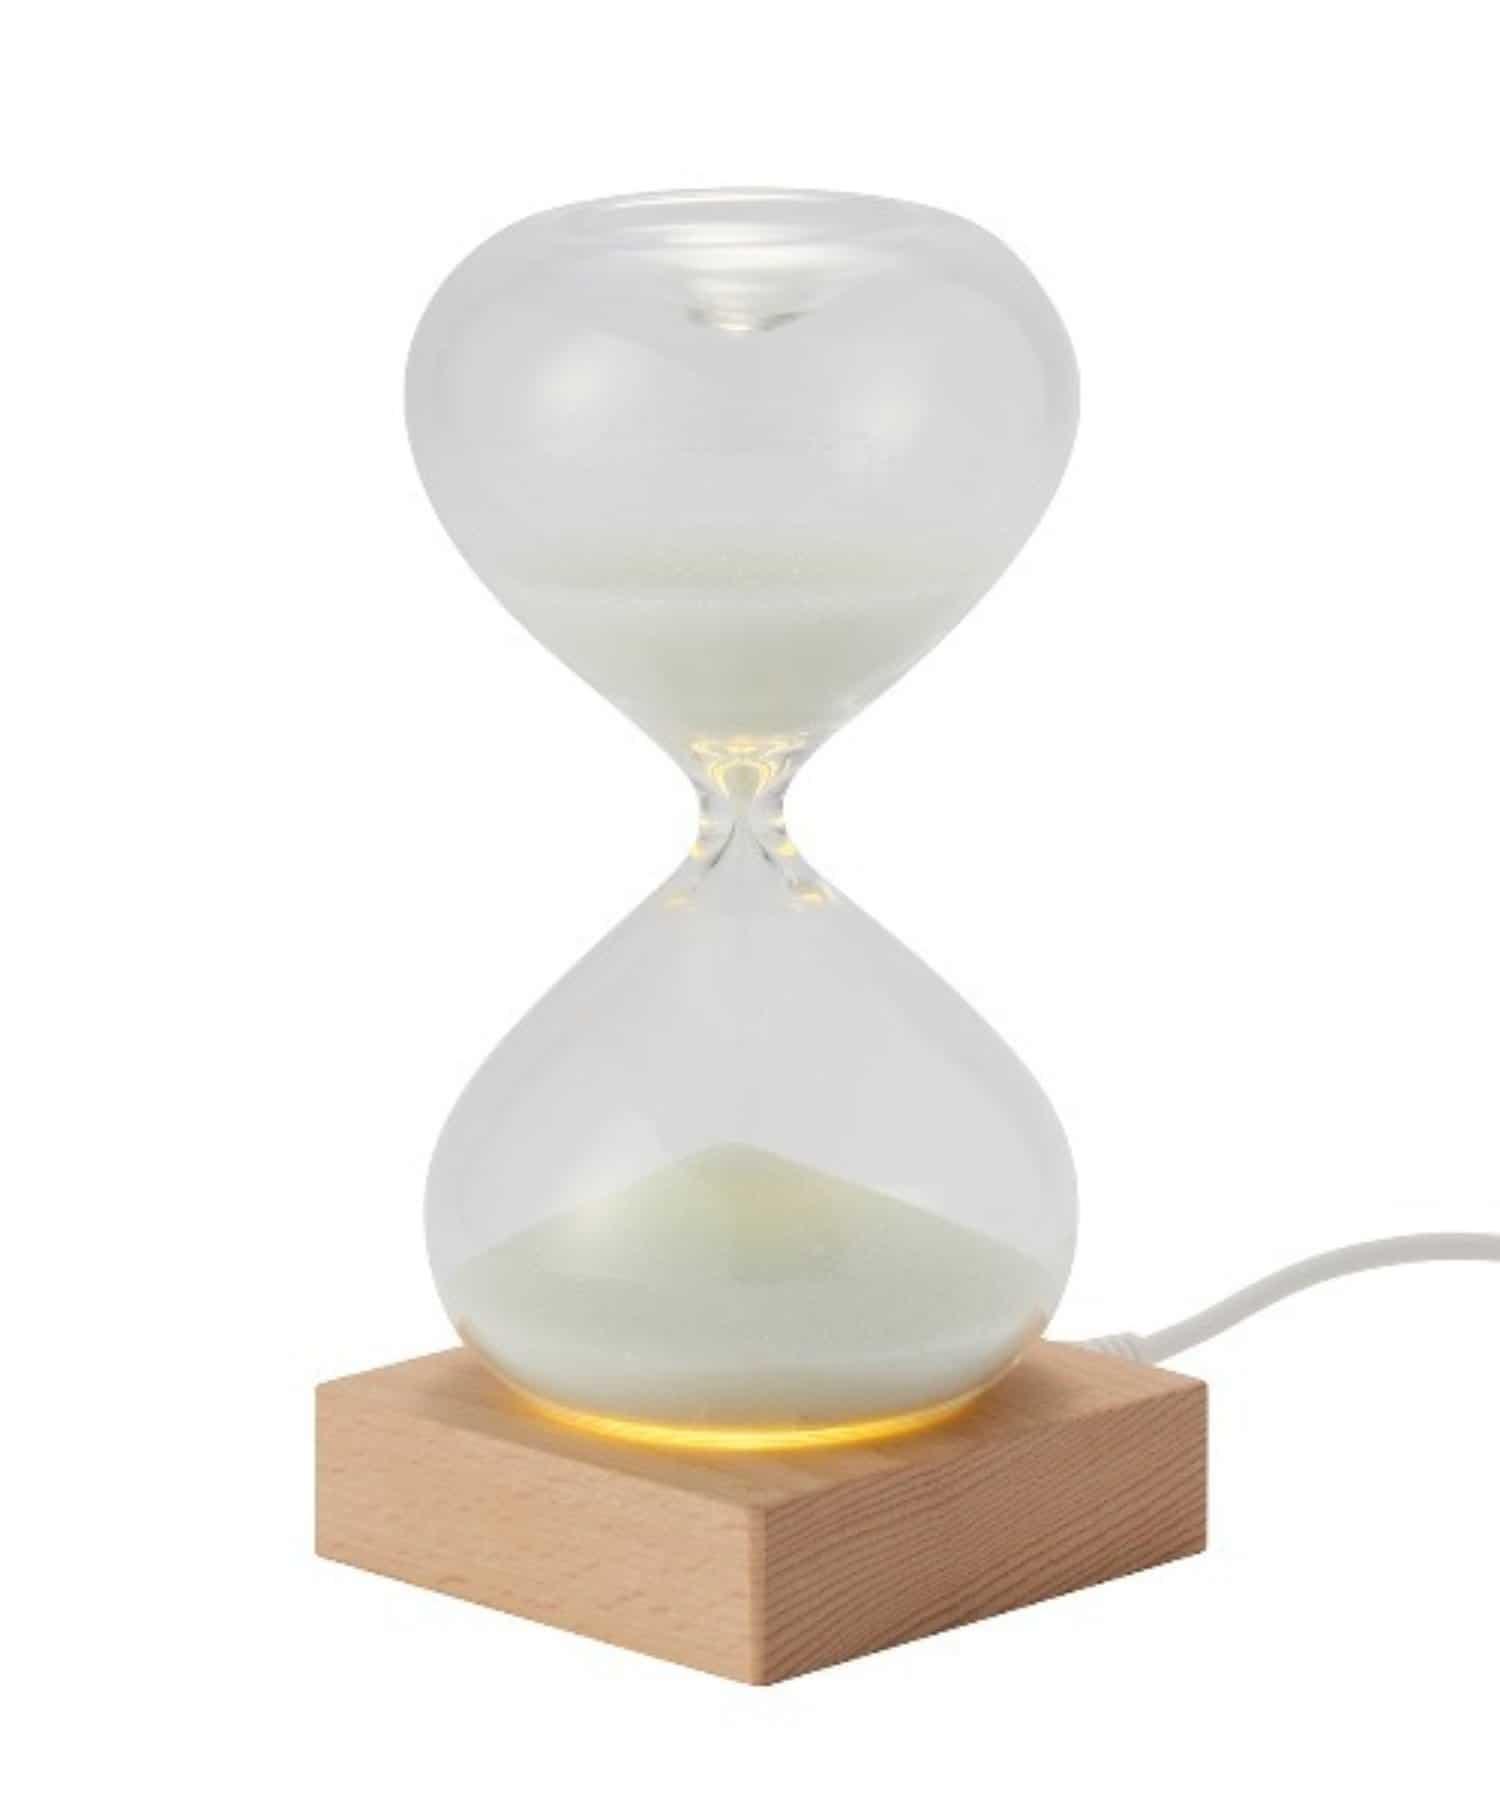 BIRTHDAY BAR(バースデイバー) 砂時計 LEDライト付き 15分計